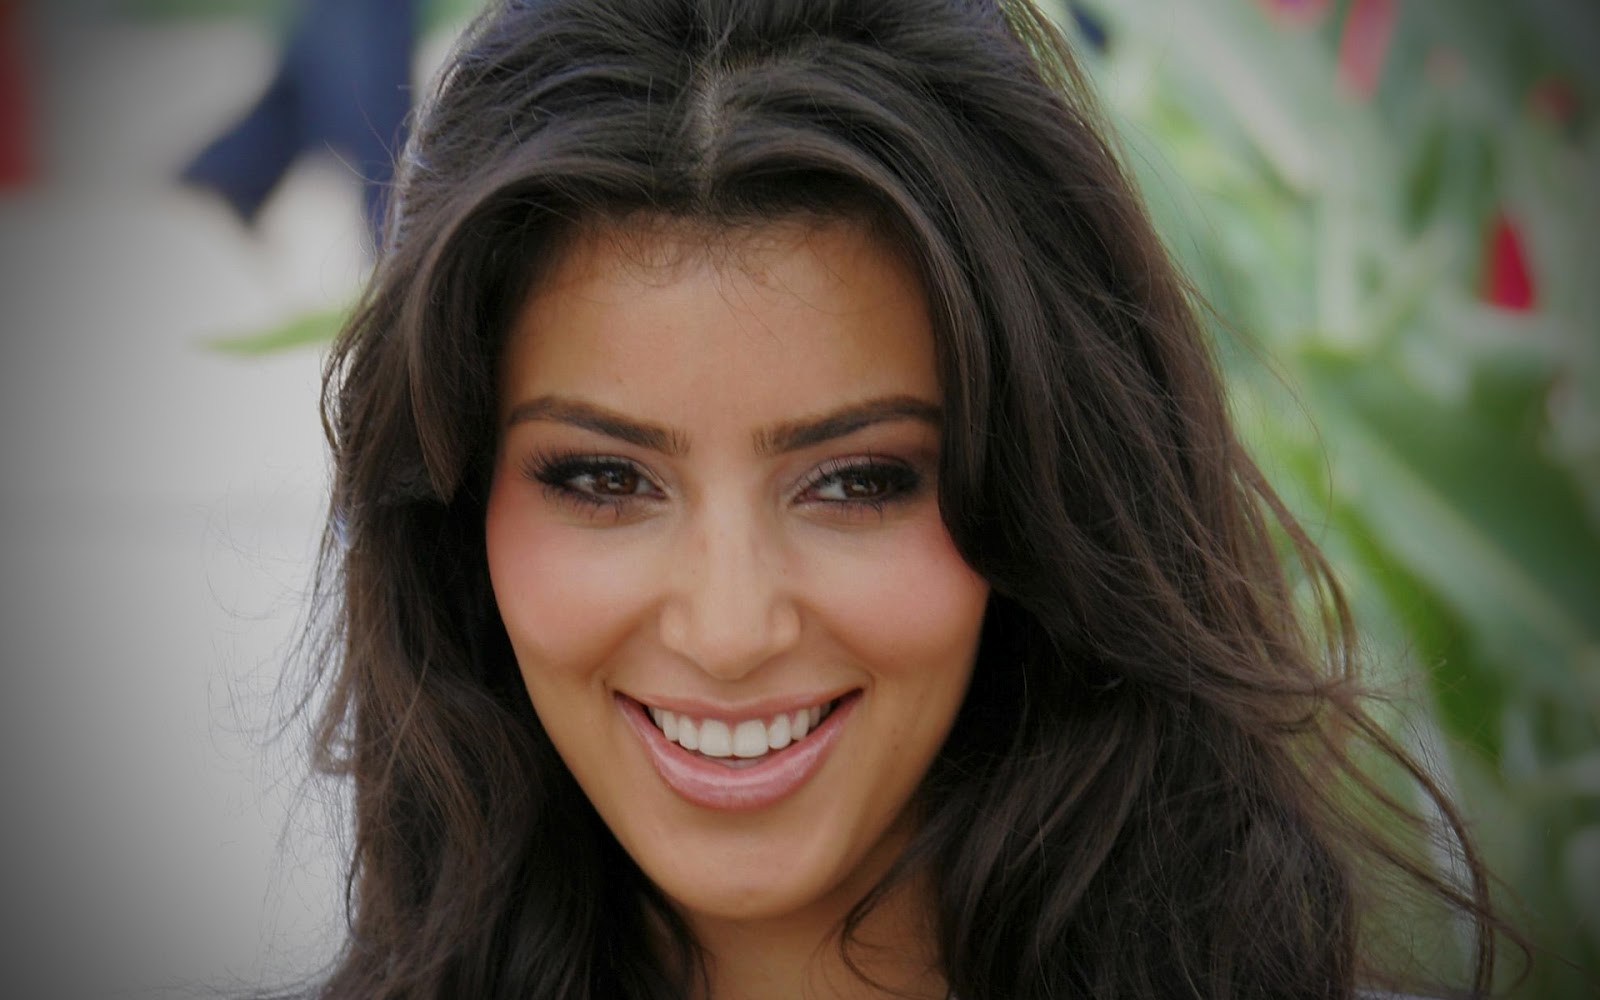 http://4.bp.blogspot.com/-IK2MY-DZ6DA/UFAoM5dulGI/AAAAAAAAJG4/20y1yGhSPmM/s1600/kim-kardashian-glamour-stills-www.chennaifans.blogspot.in+(10).jpg